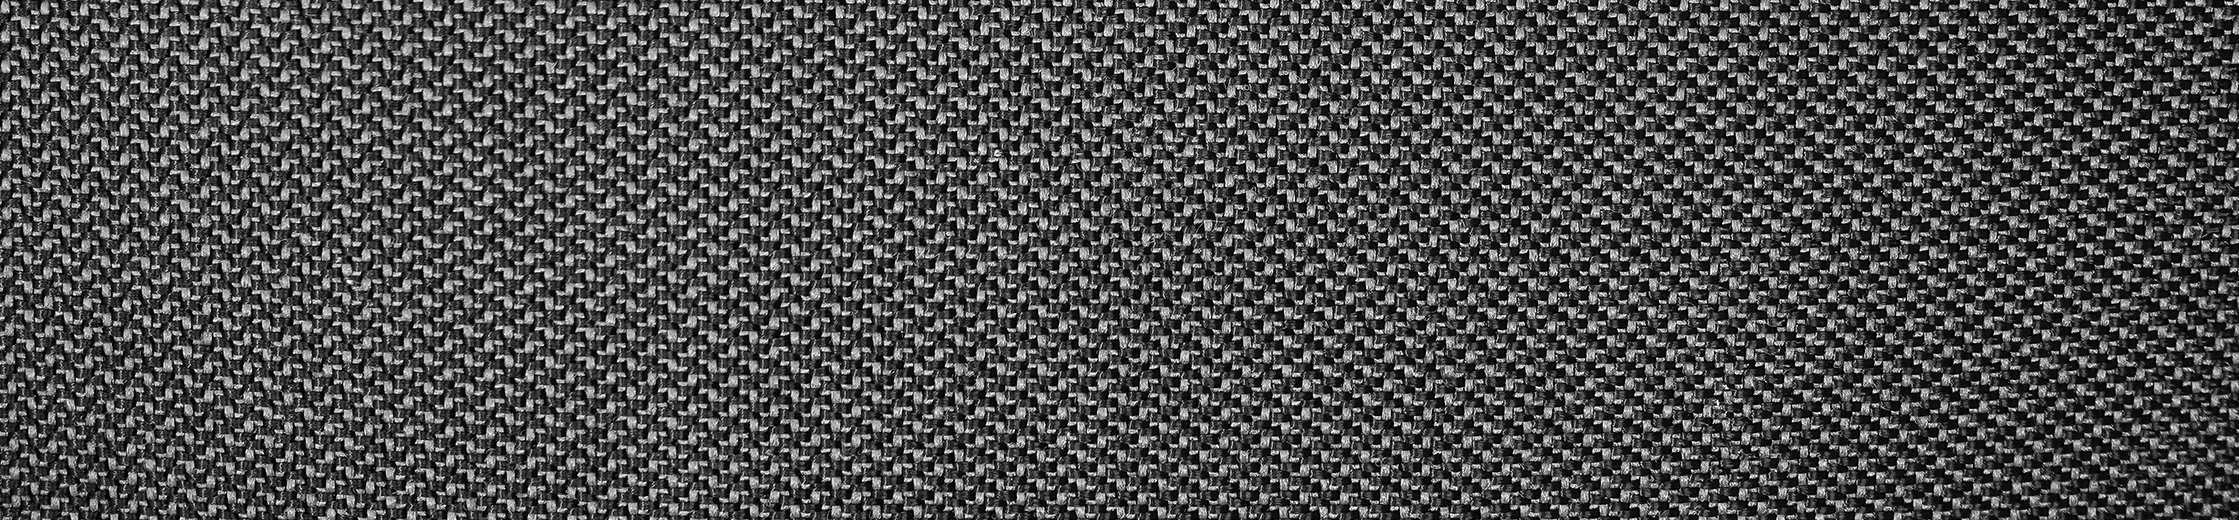 Polypropylene & Nylon Blend